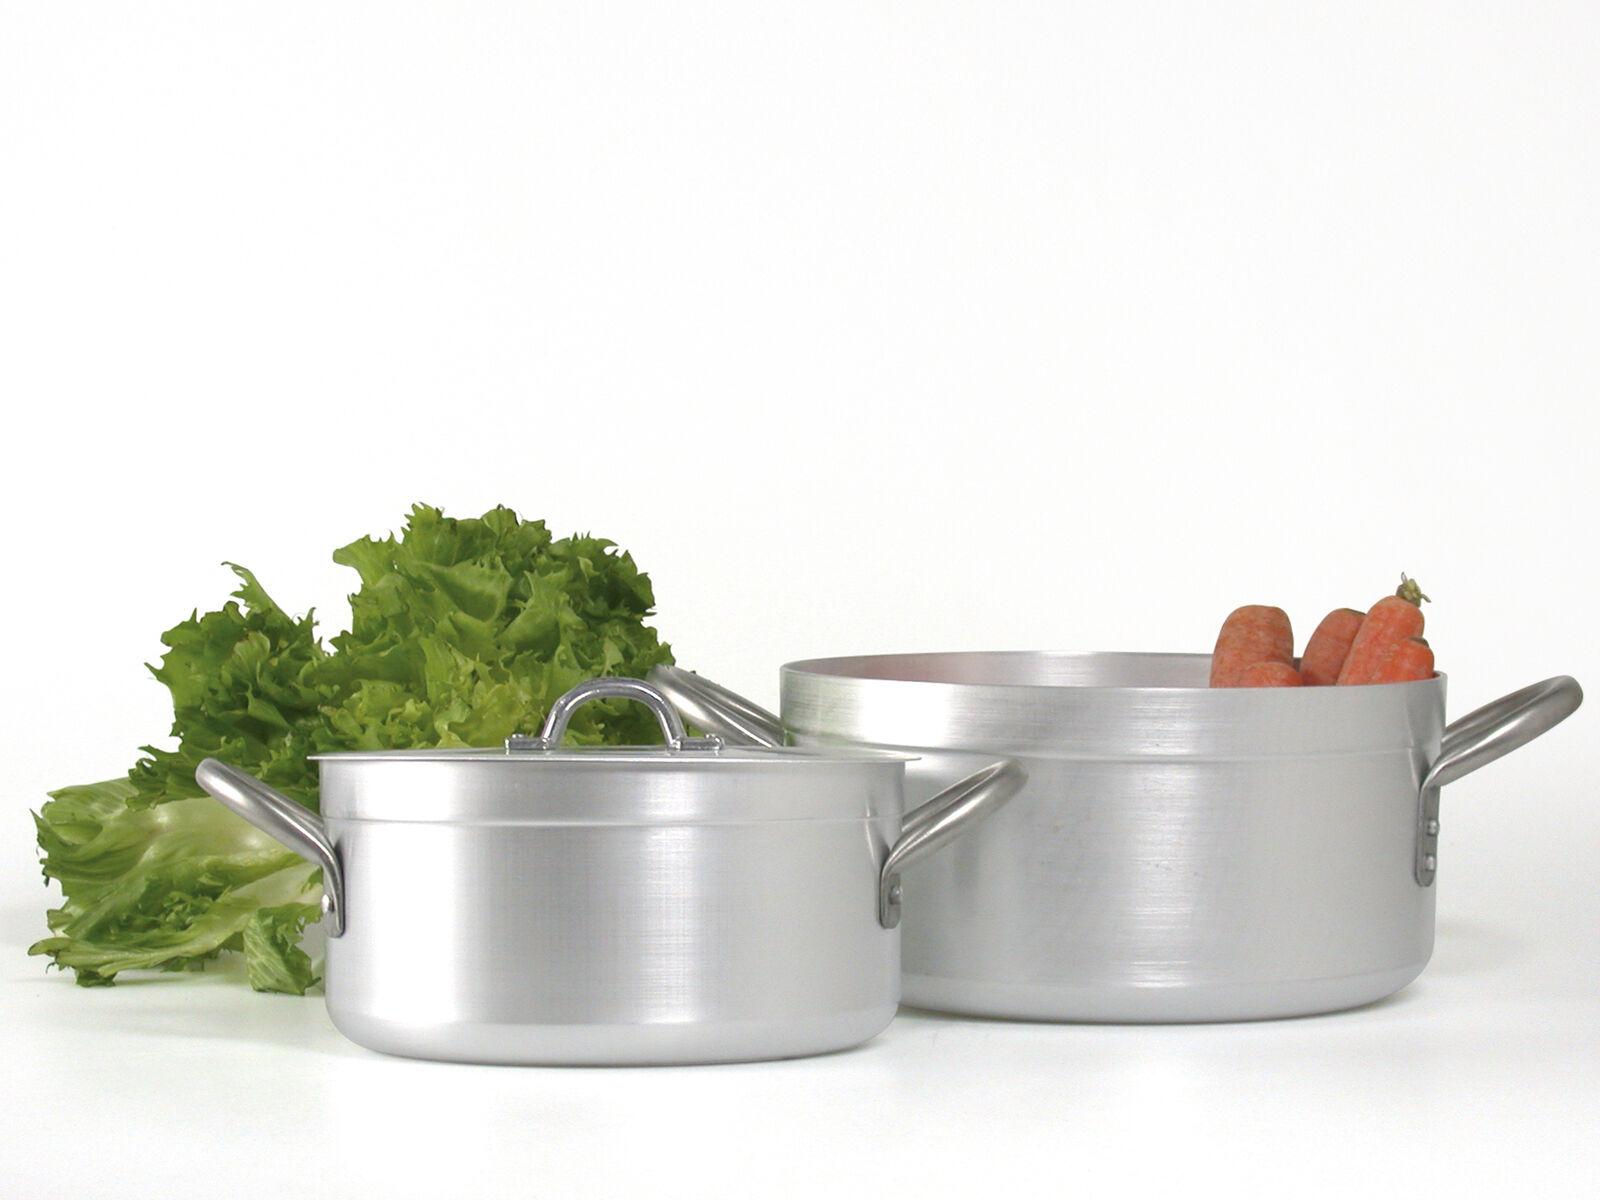 PARDINI Casseruola alluminio albergo media 2 manici 14 pentola da cucina